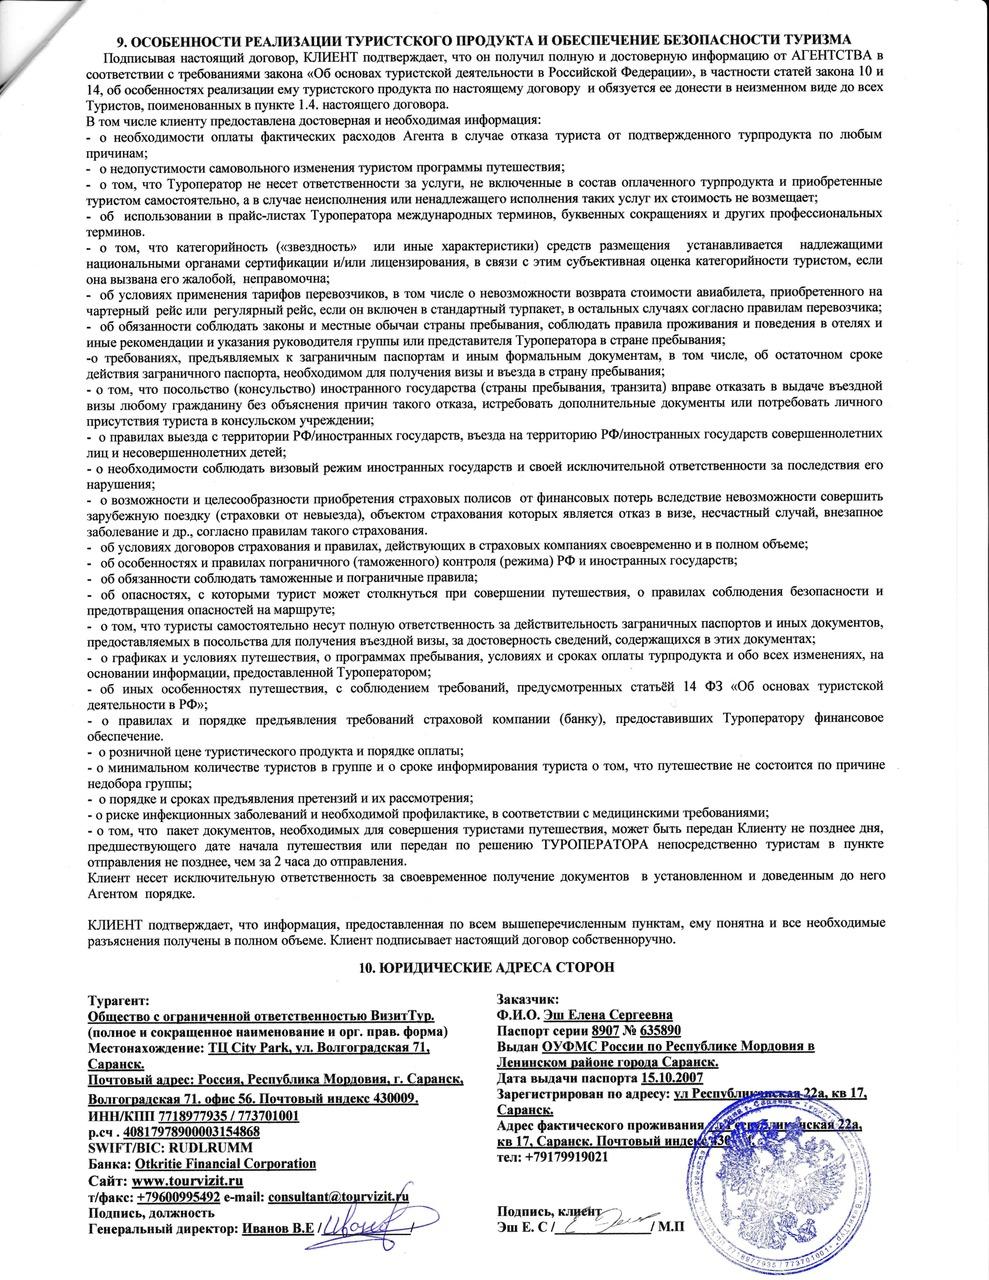 ekaterinatkachenko4xif6e.jpg